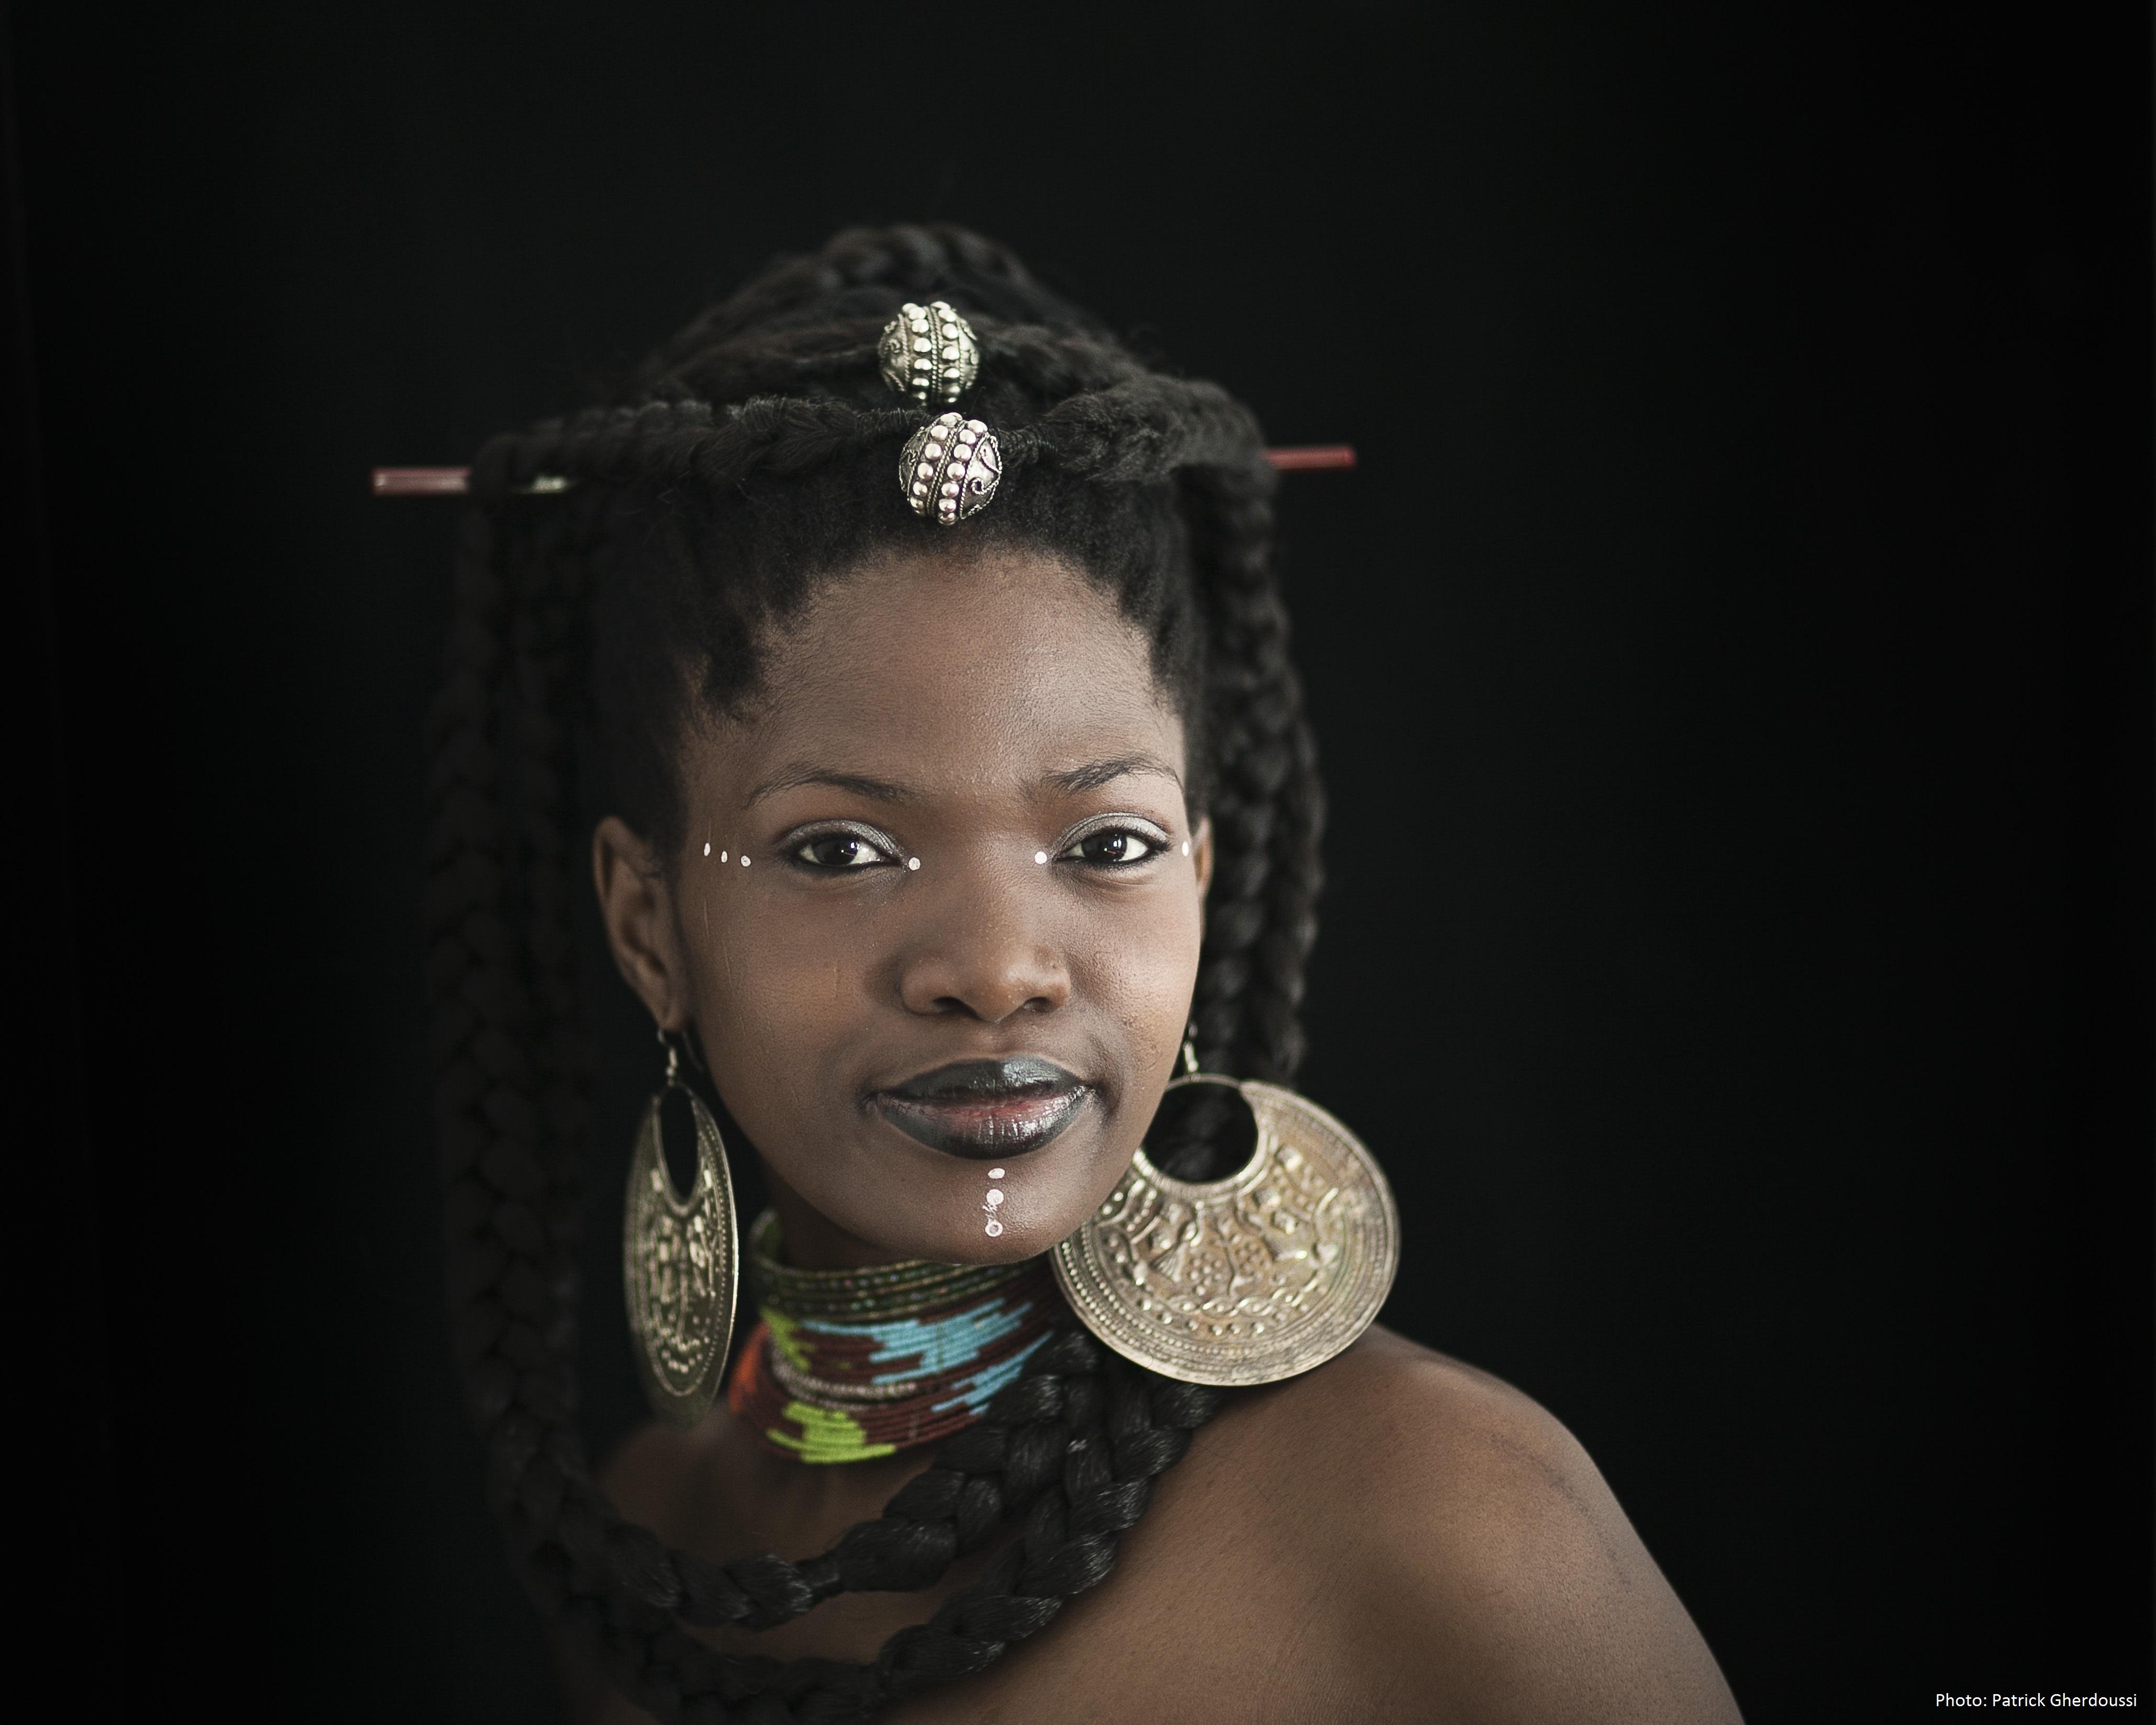 La chanteuse Sibongile MBAMBO dites Bongi pour le festival LES FESTIVES 2016